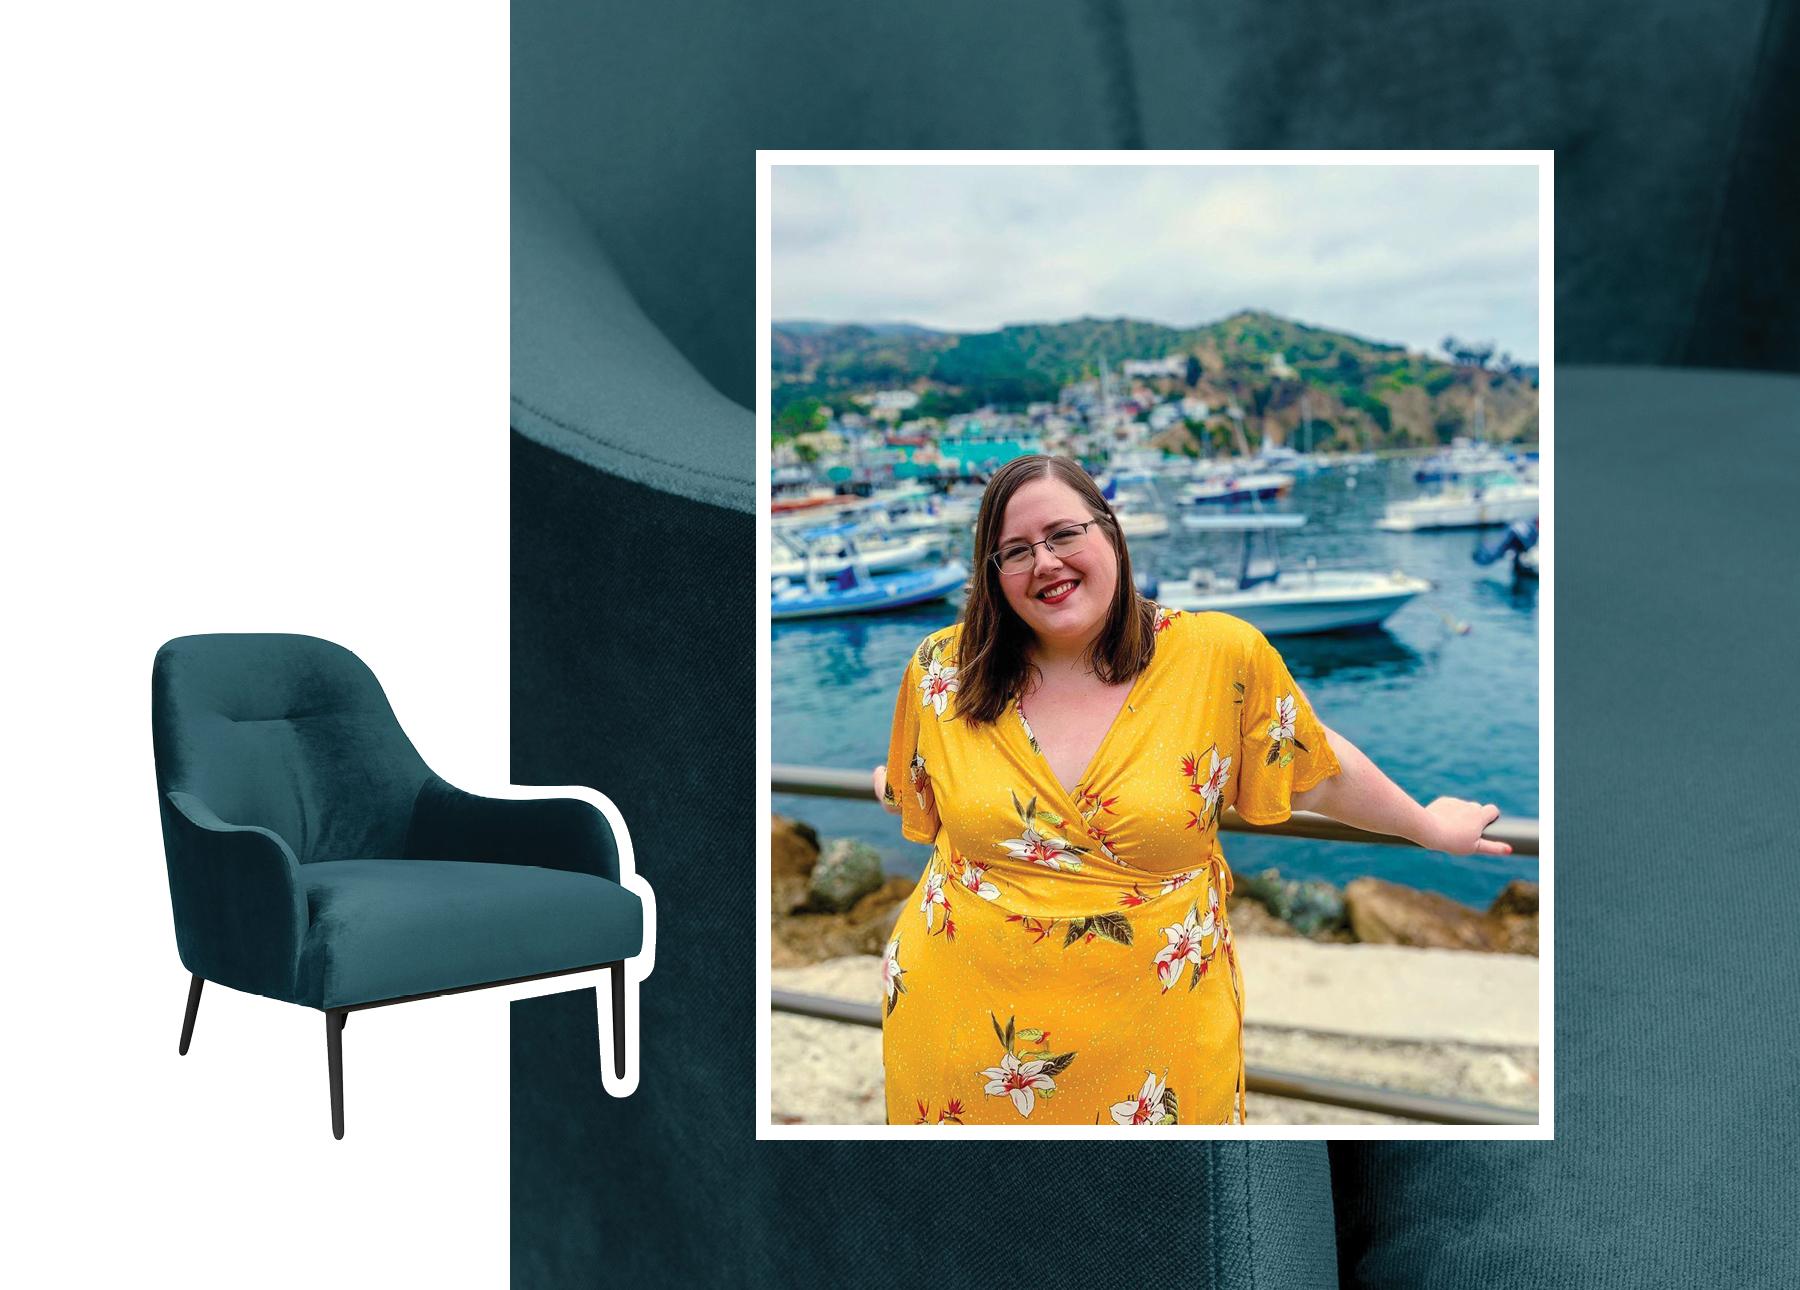 Sarah Wilson, Creator of BudgetGirl, with an Embrace Chair.